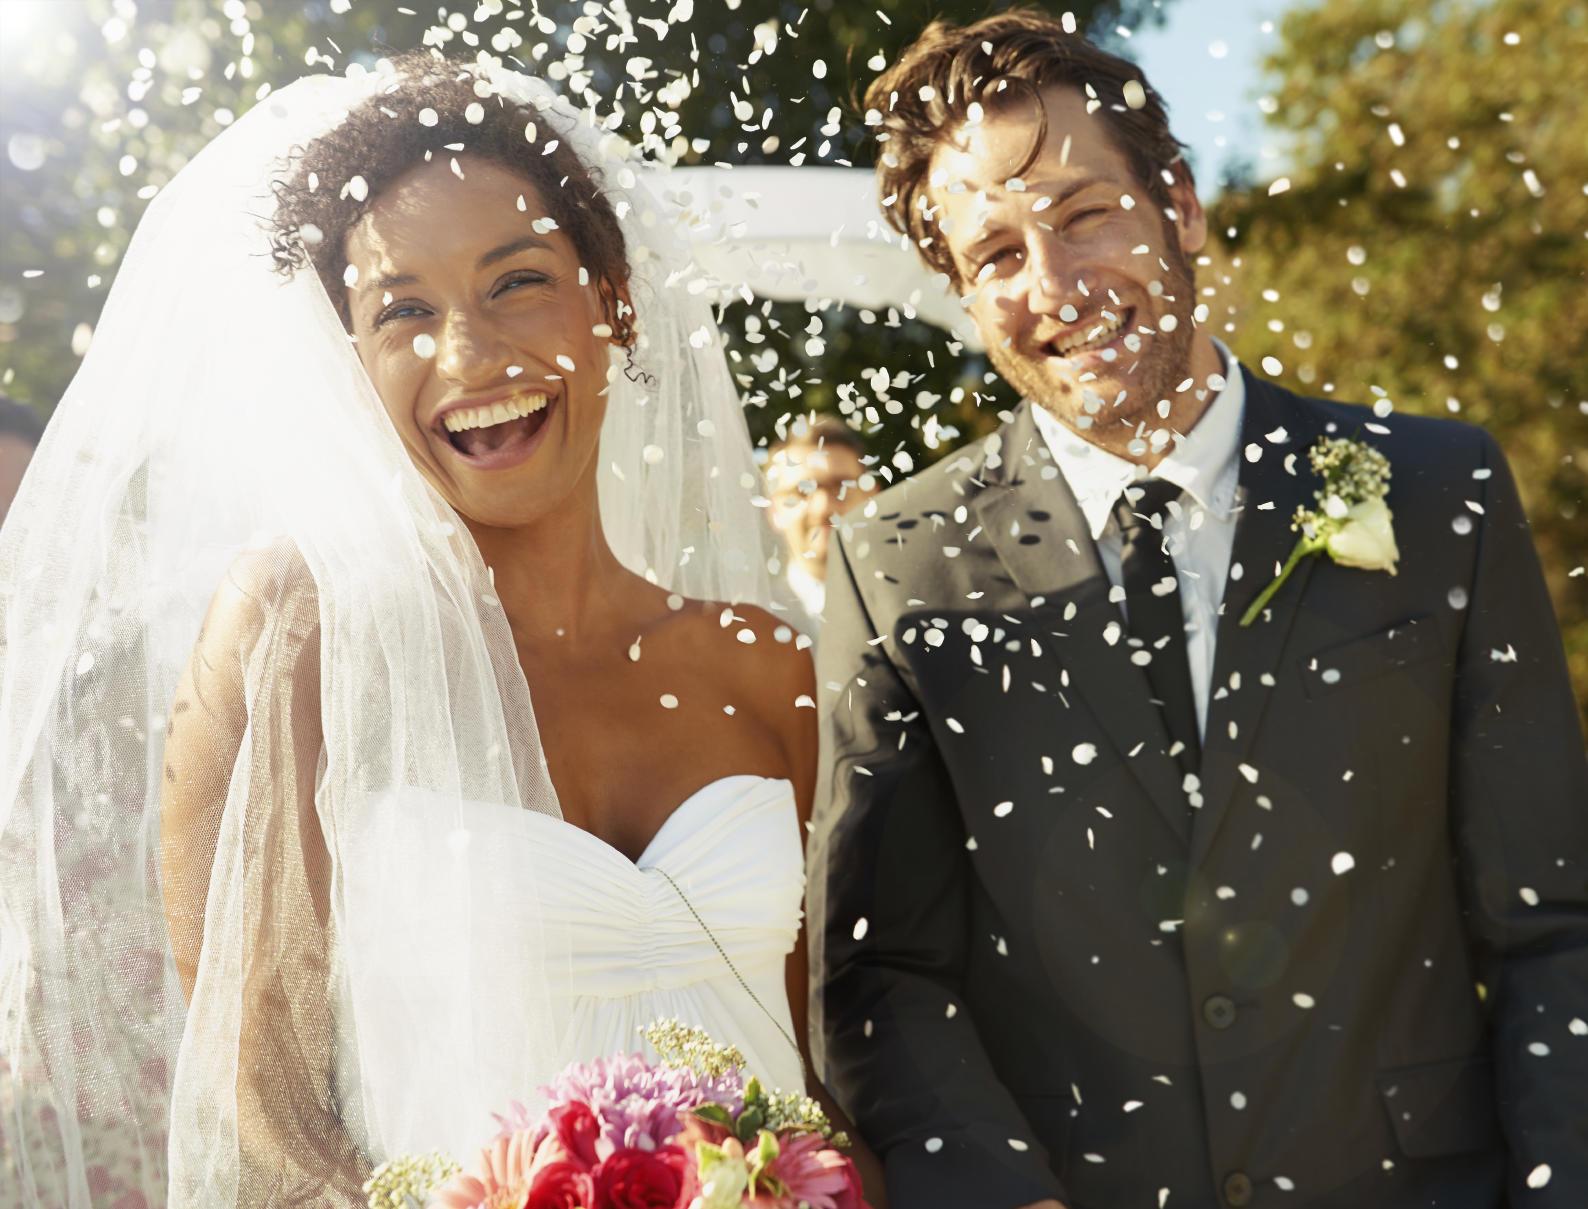 wedding couple bride groom ceremony